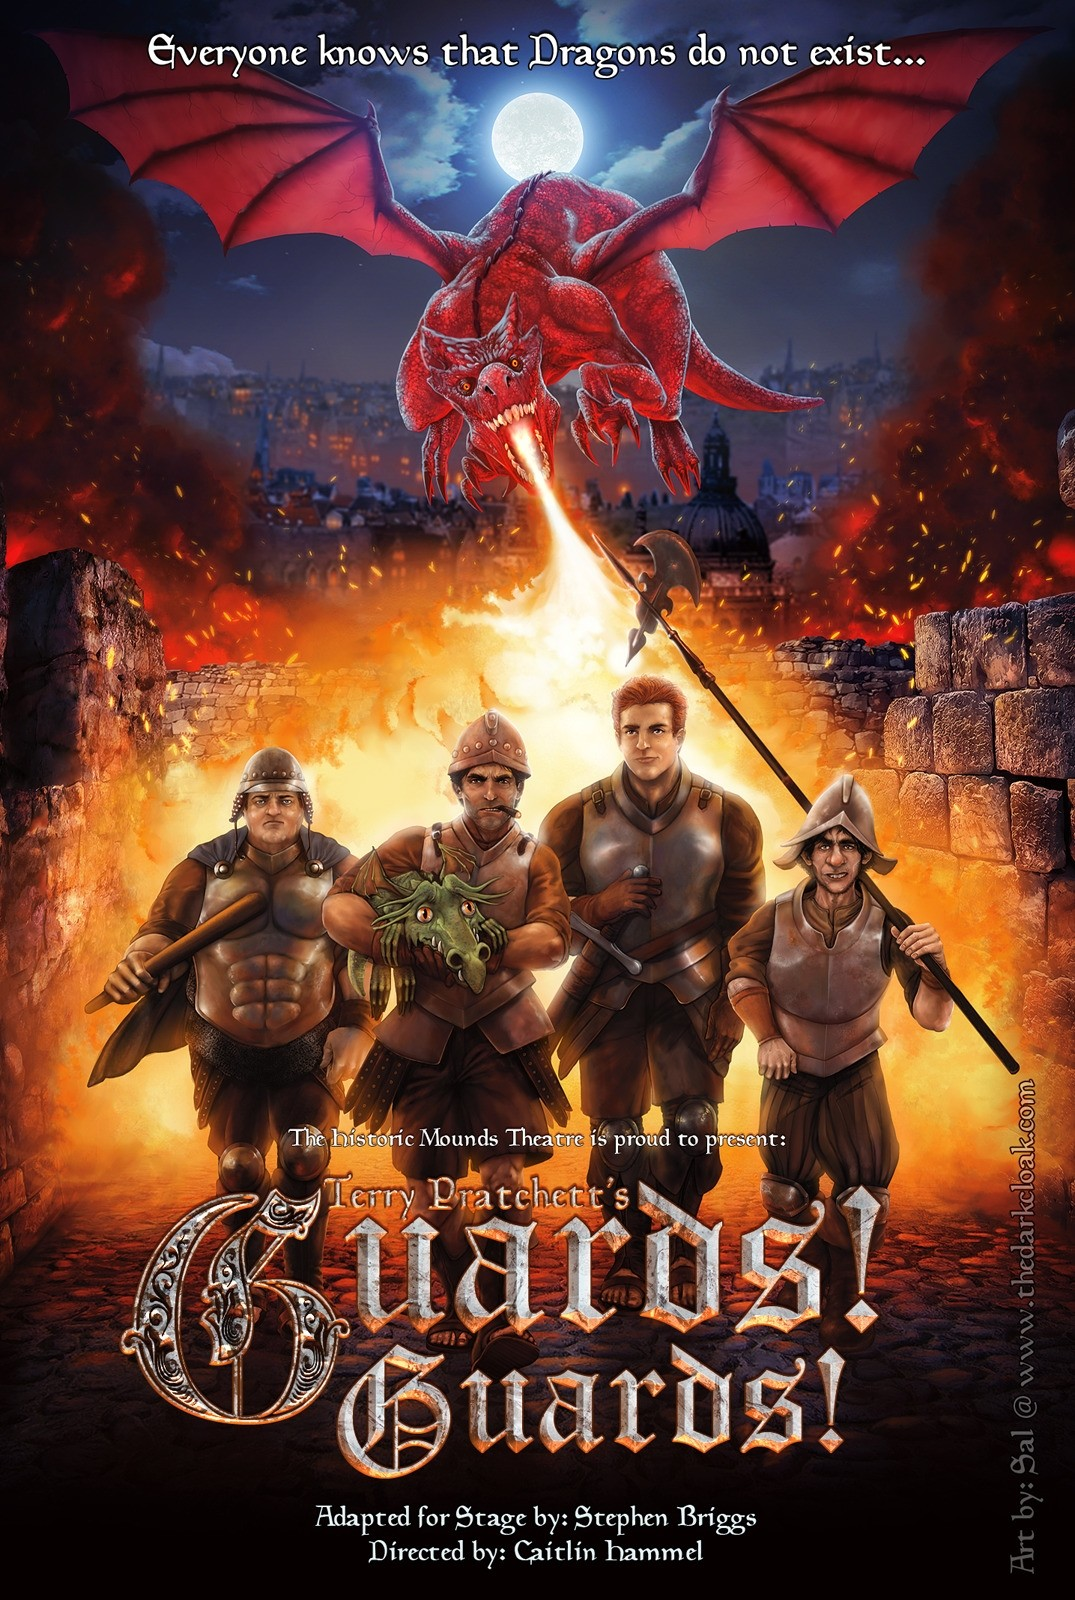 Sal vador thedarkcloak guardsguards 1280